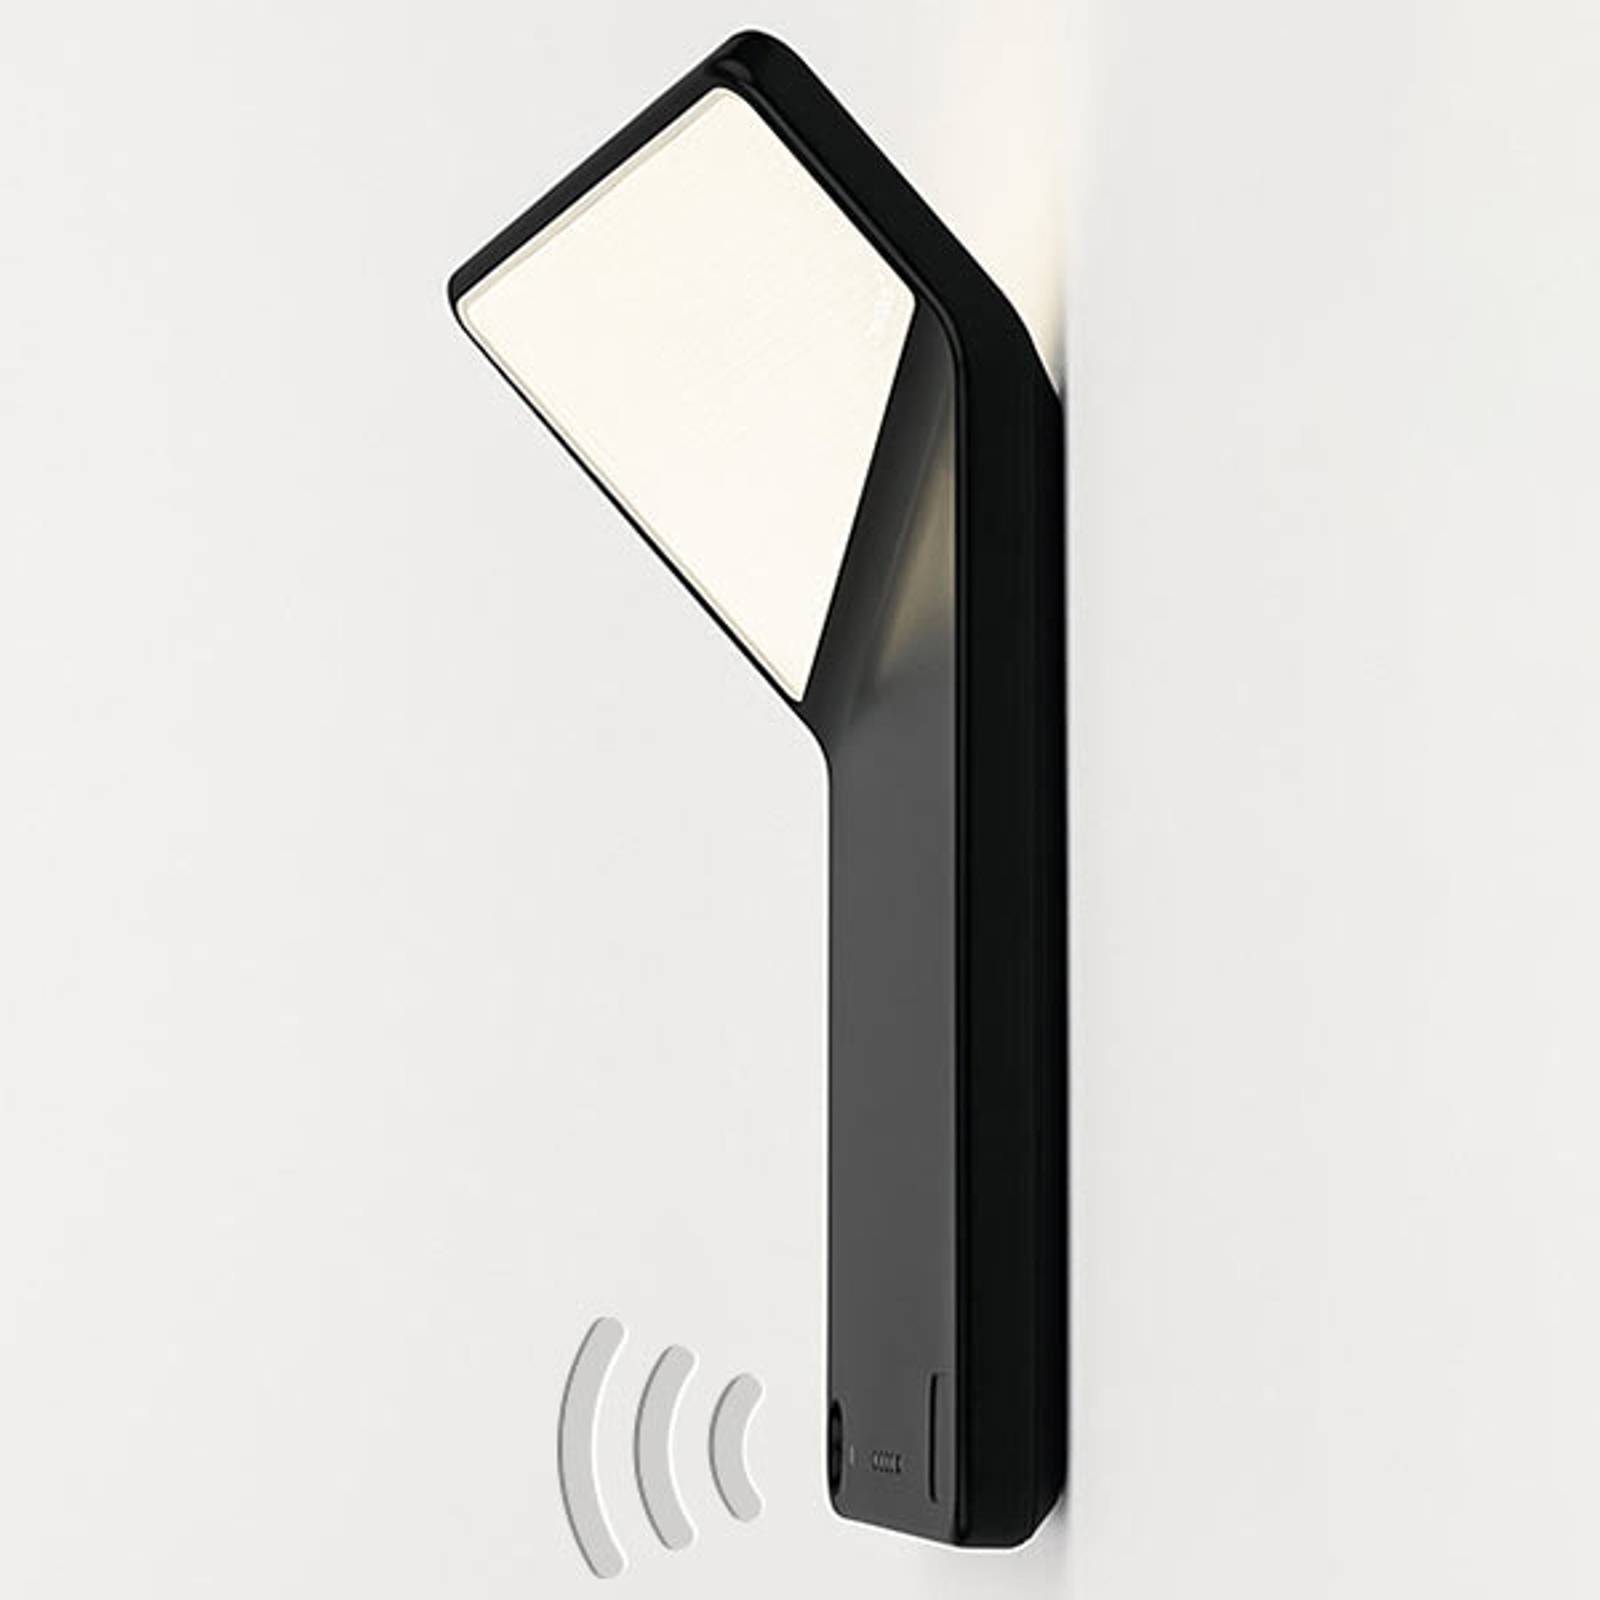 Nimbus Winglet CL LED-Wandleuchte, schwarz matt